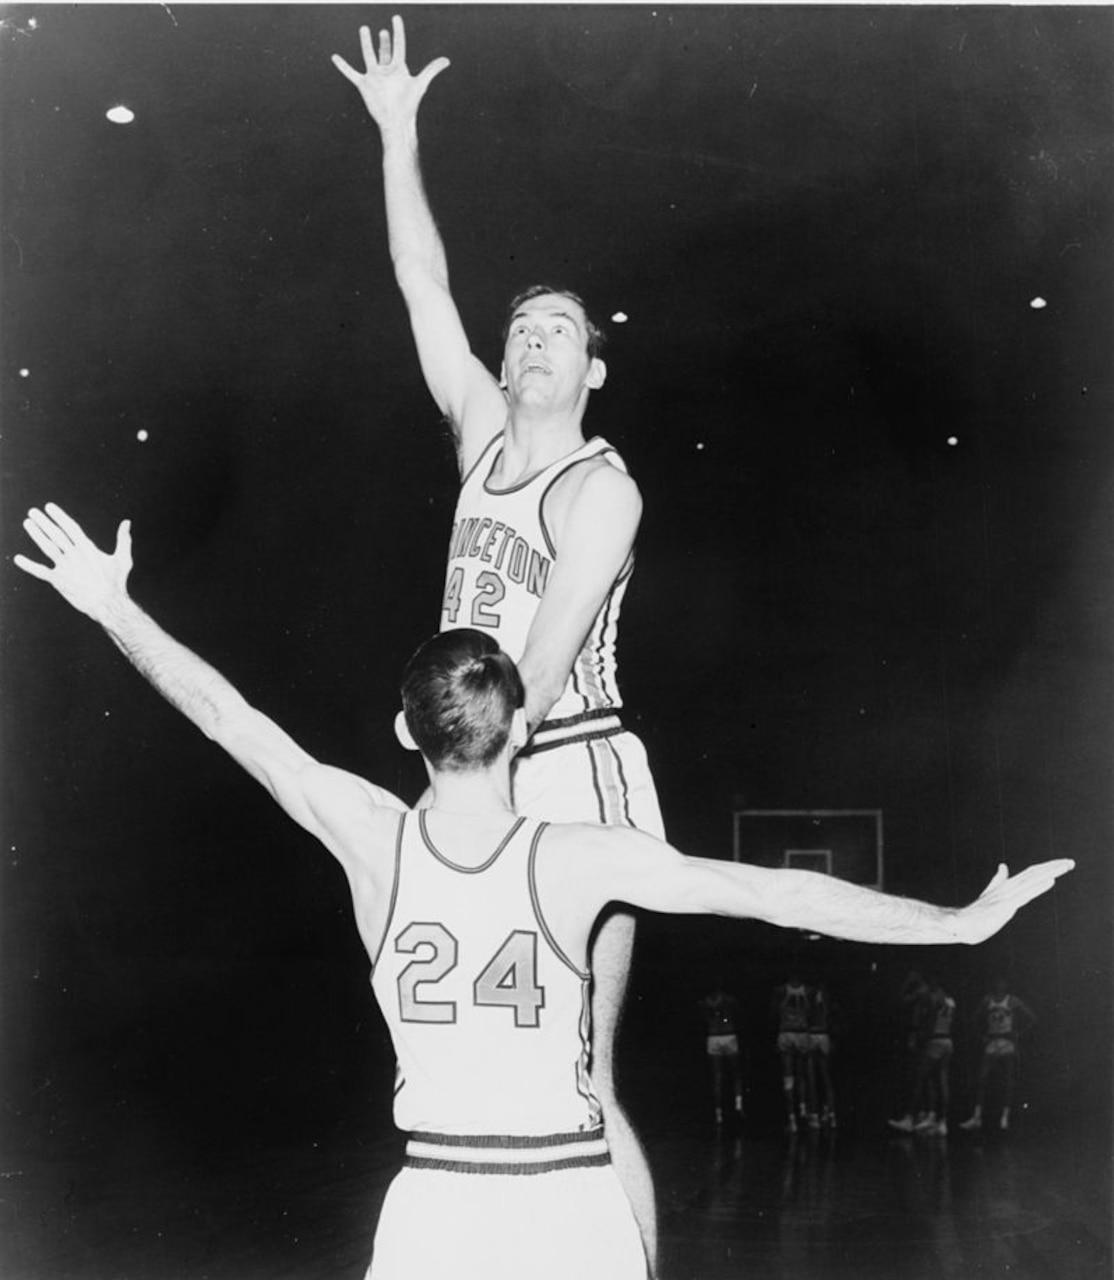 Men play basketball in a gymnasium.